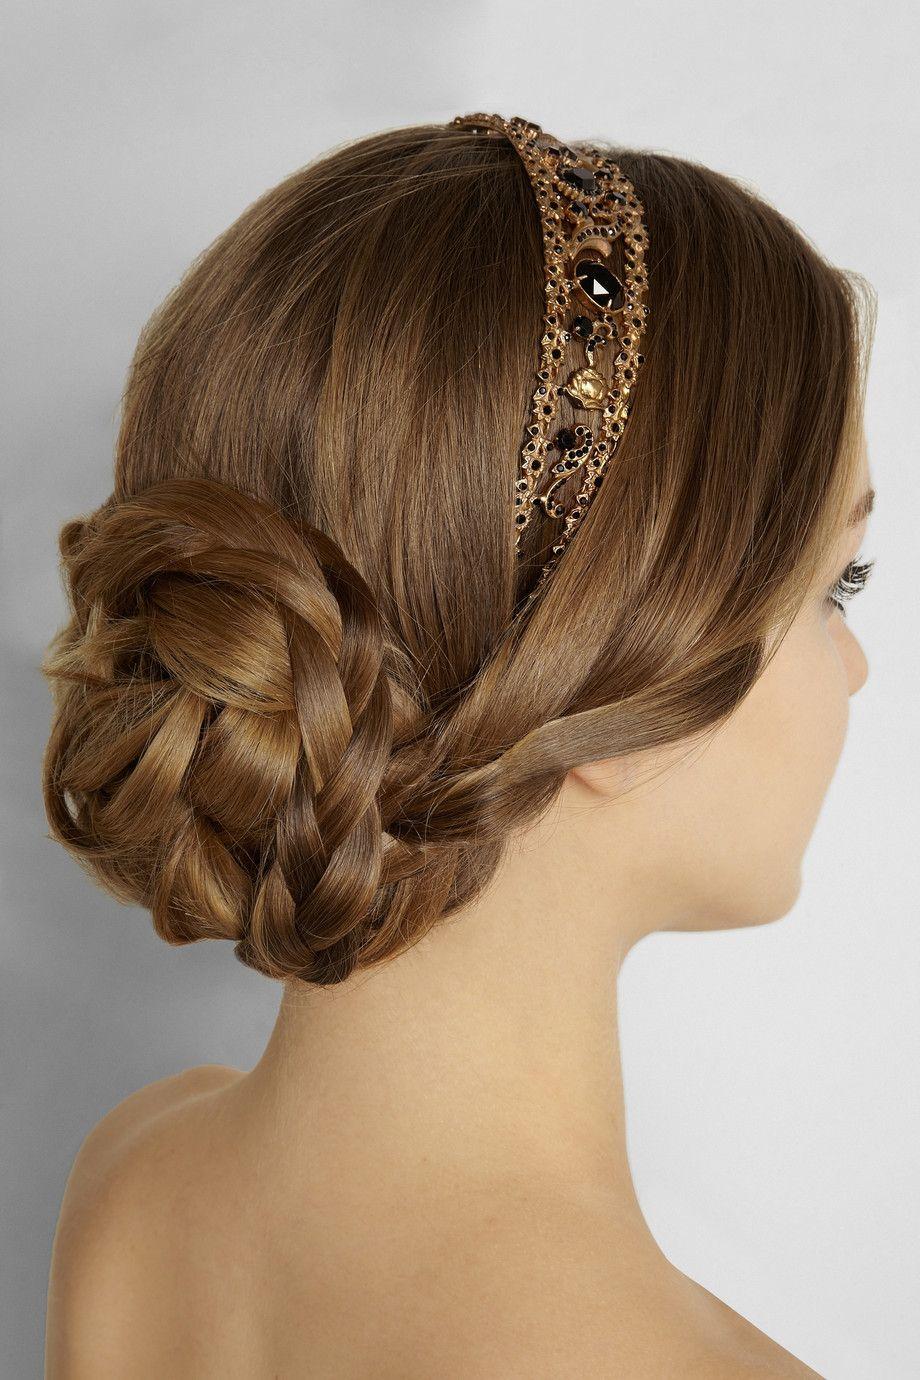 Dolce & Gabbana Goldtone Swarovski crystal headband